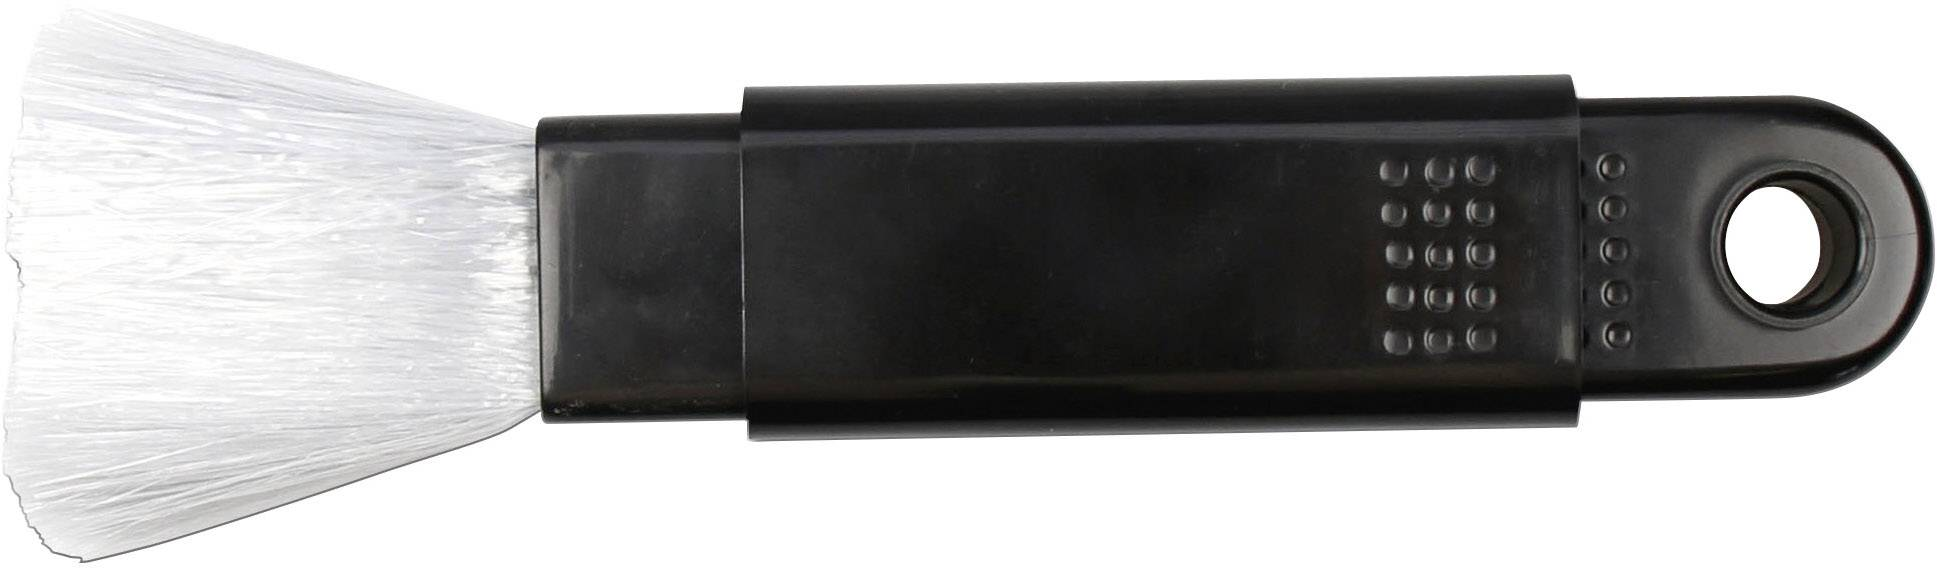 Prachový štětec RS 1000, 30176